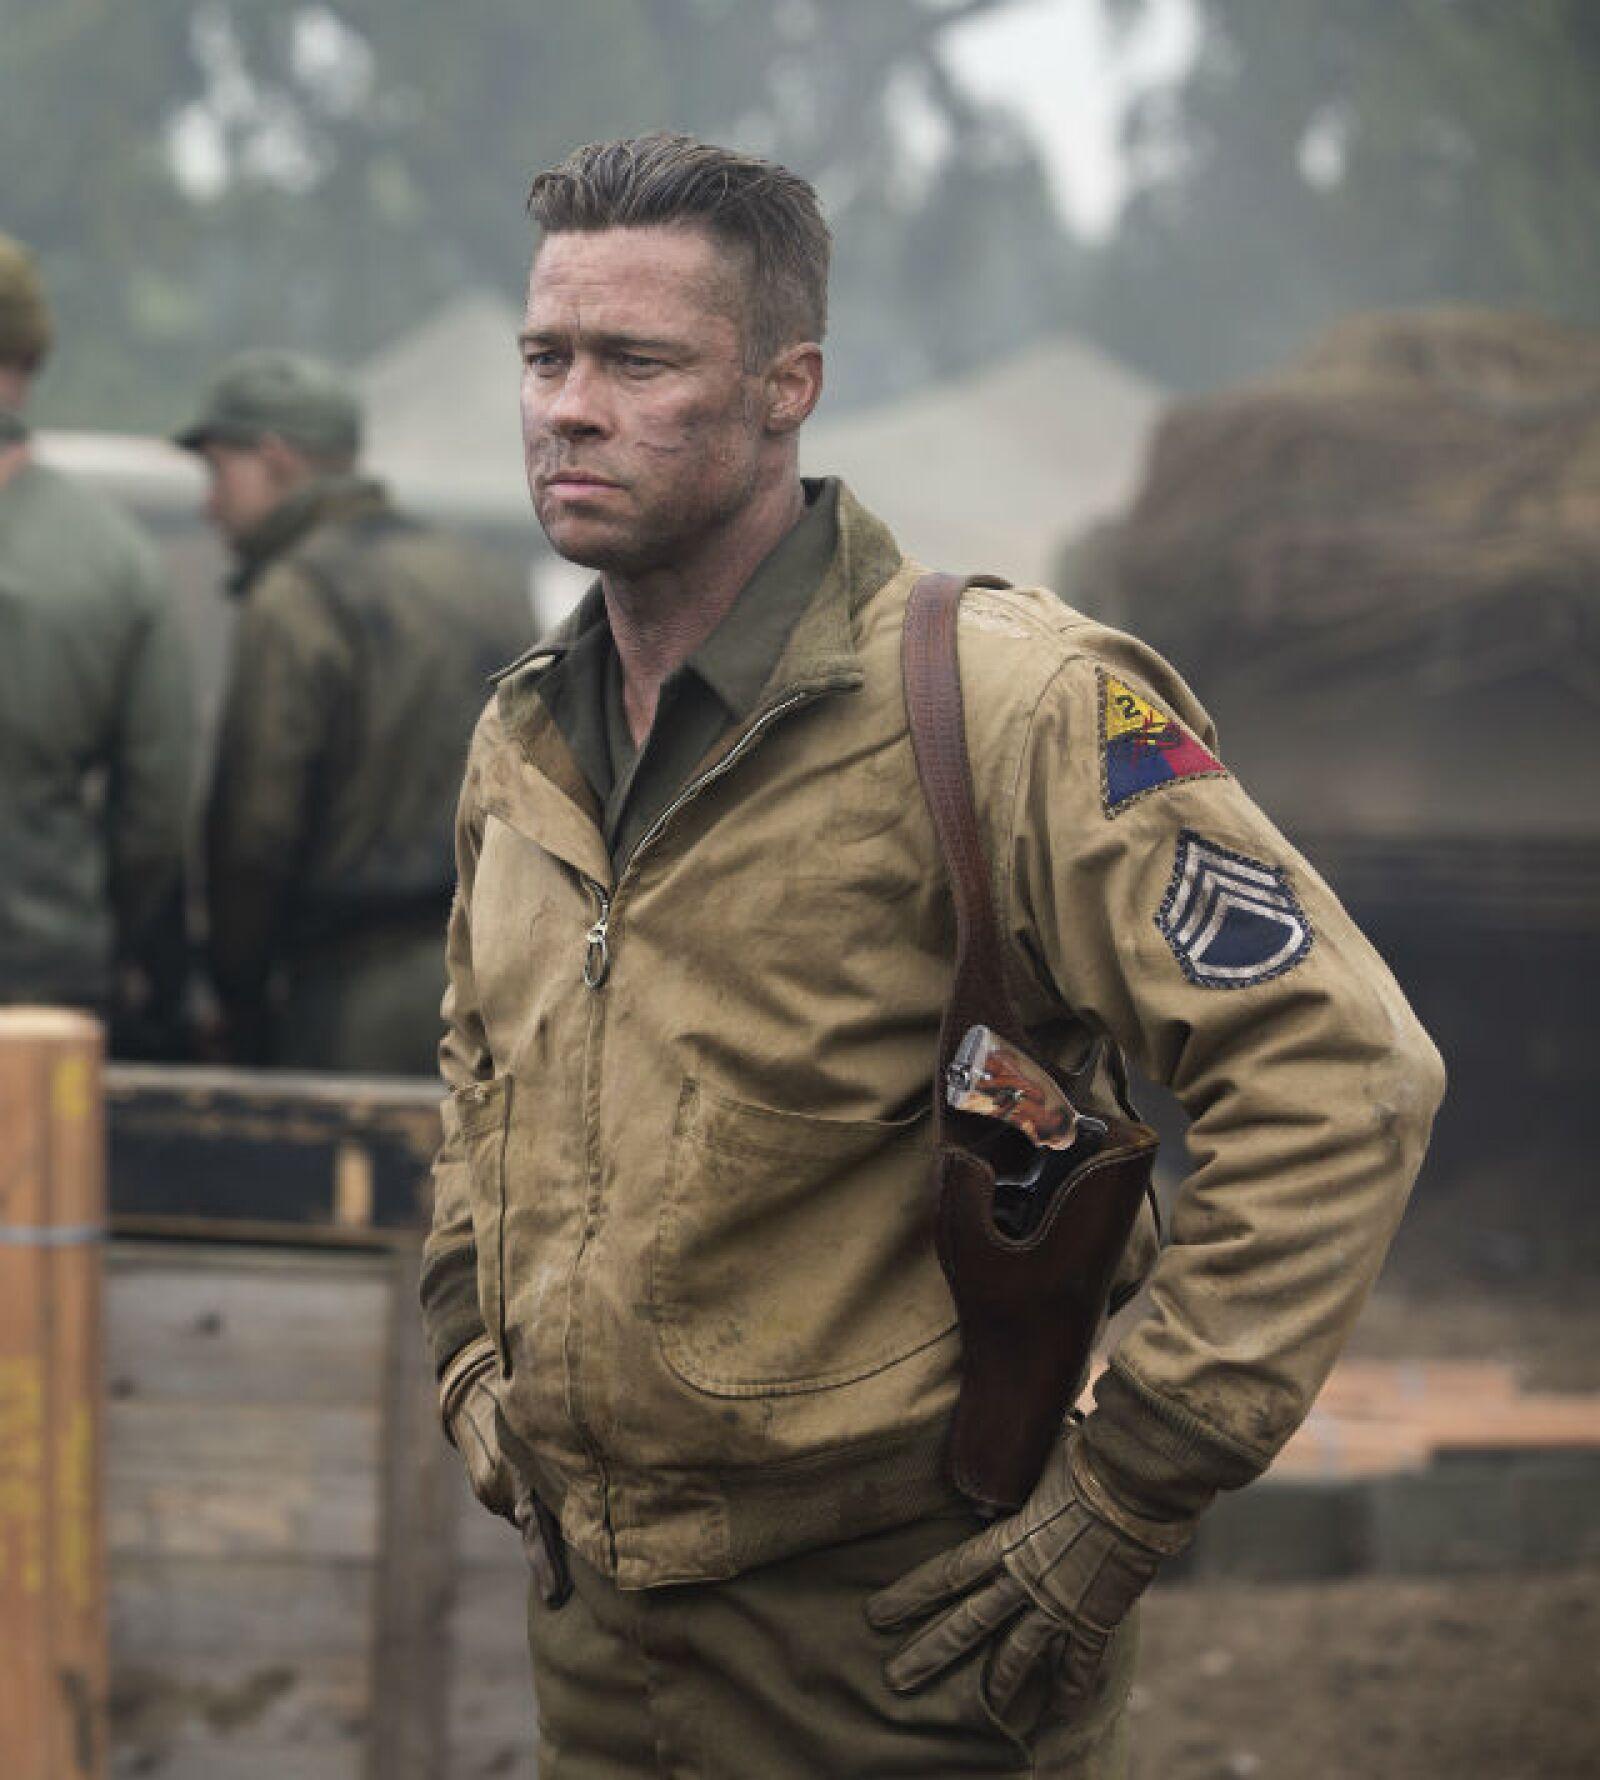 Brad Pitt lidera a una tropa en la Segunda Guerra Mundial en la película bélica Fury.